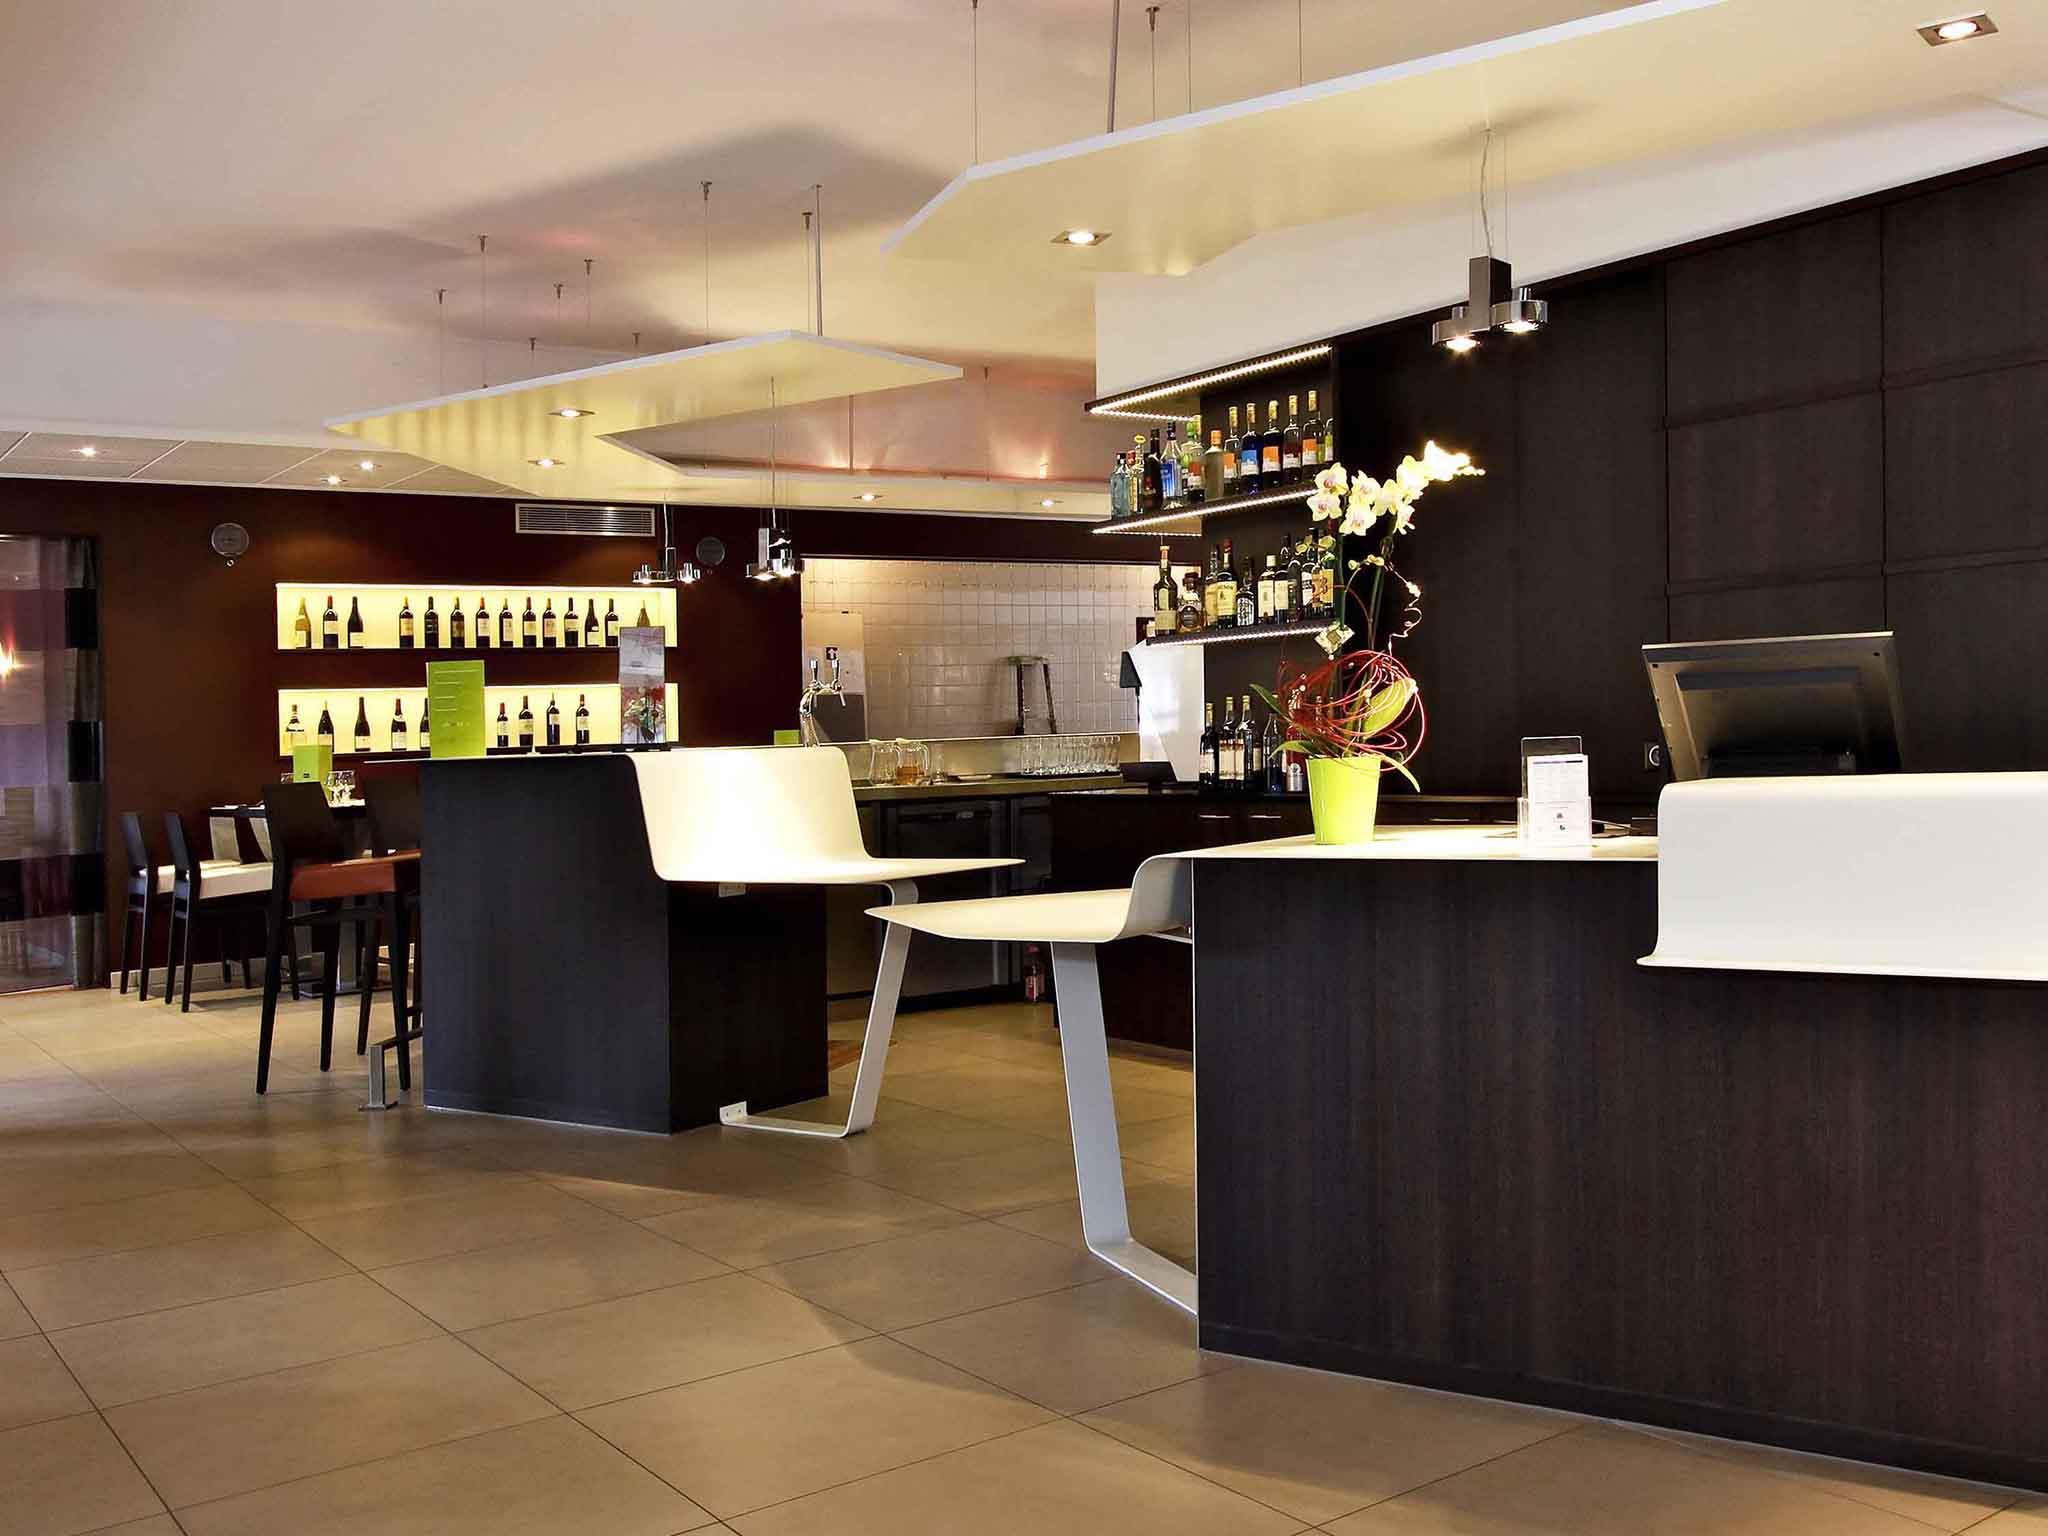 Hotel - Mercure Luxeuil Les Bains Hexagone Hotel